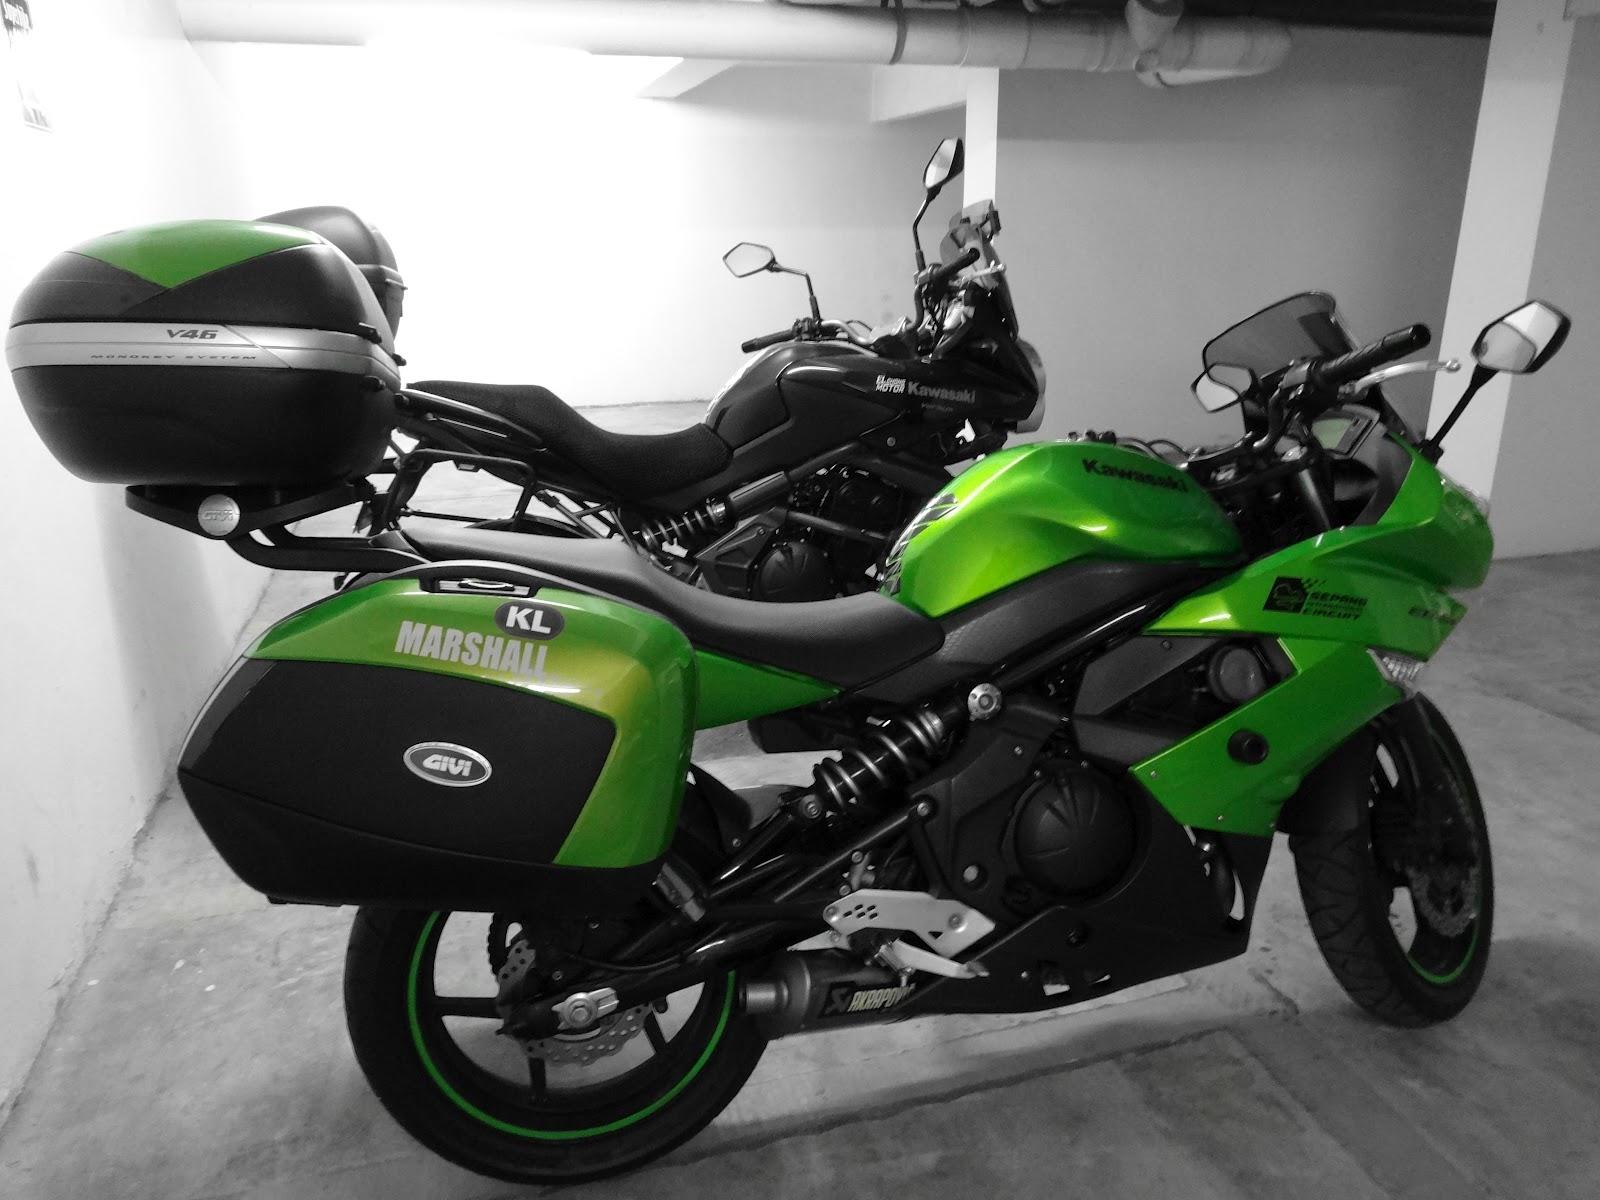 C Segment Superbike 2 Wheelers For Us Average Joes